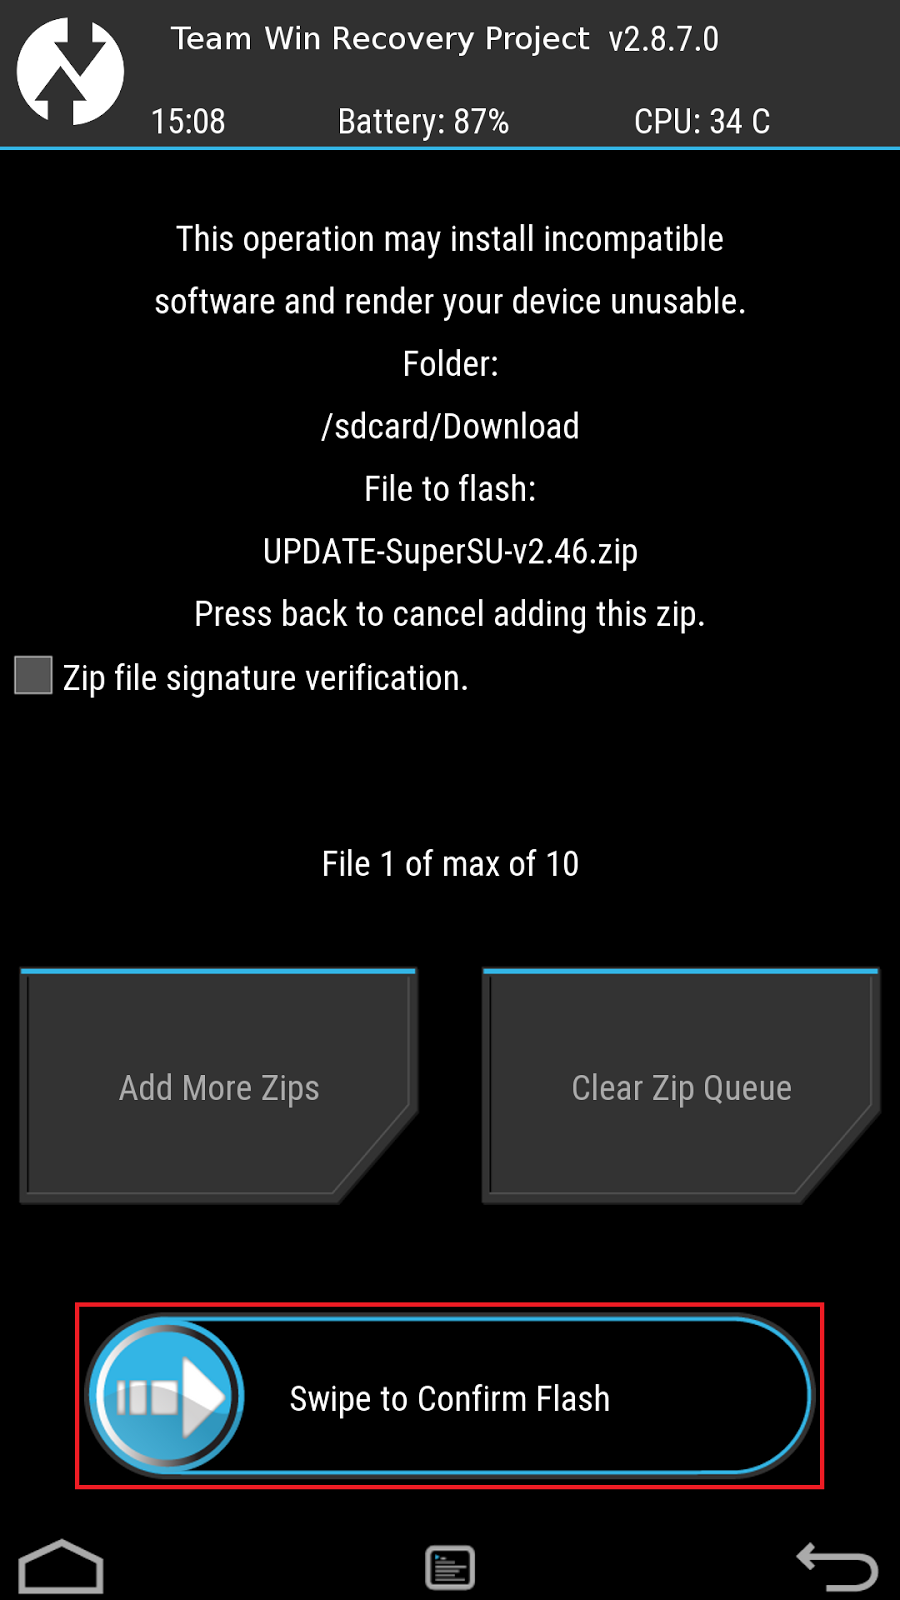 Acer Liquid Z630 (T03) ကို TWRP Recovery ထည့်သွင်း